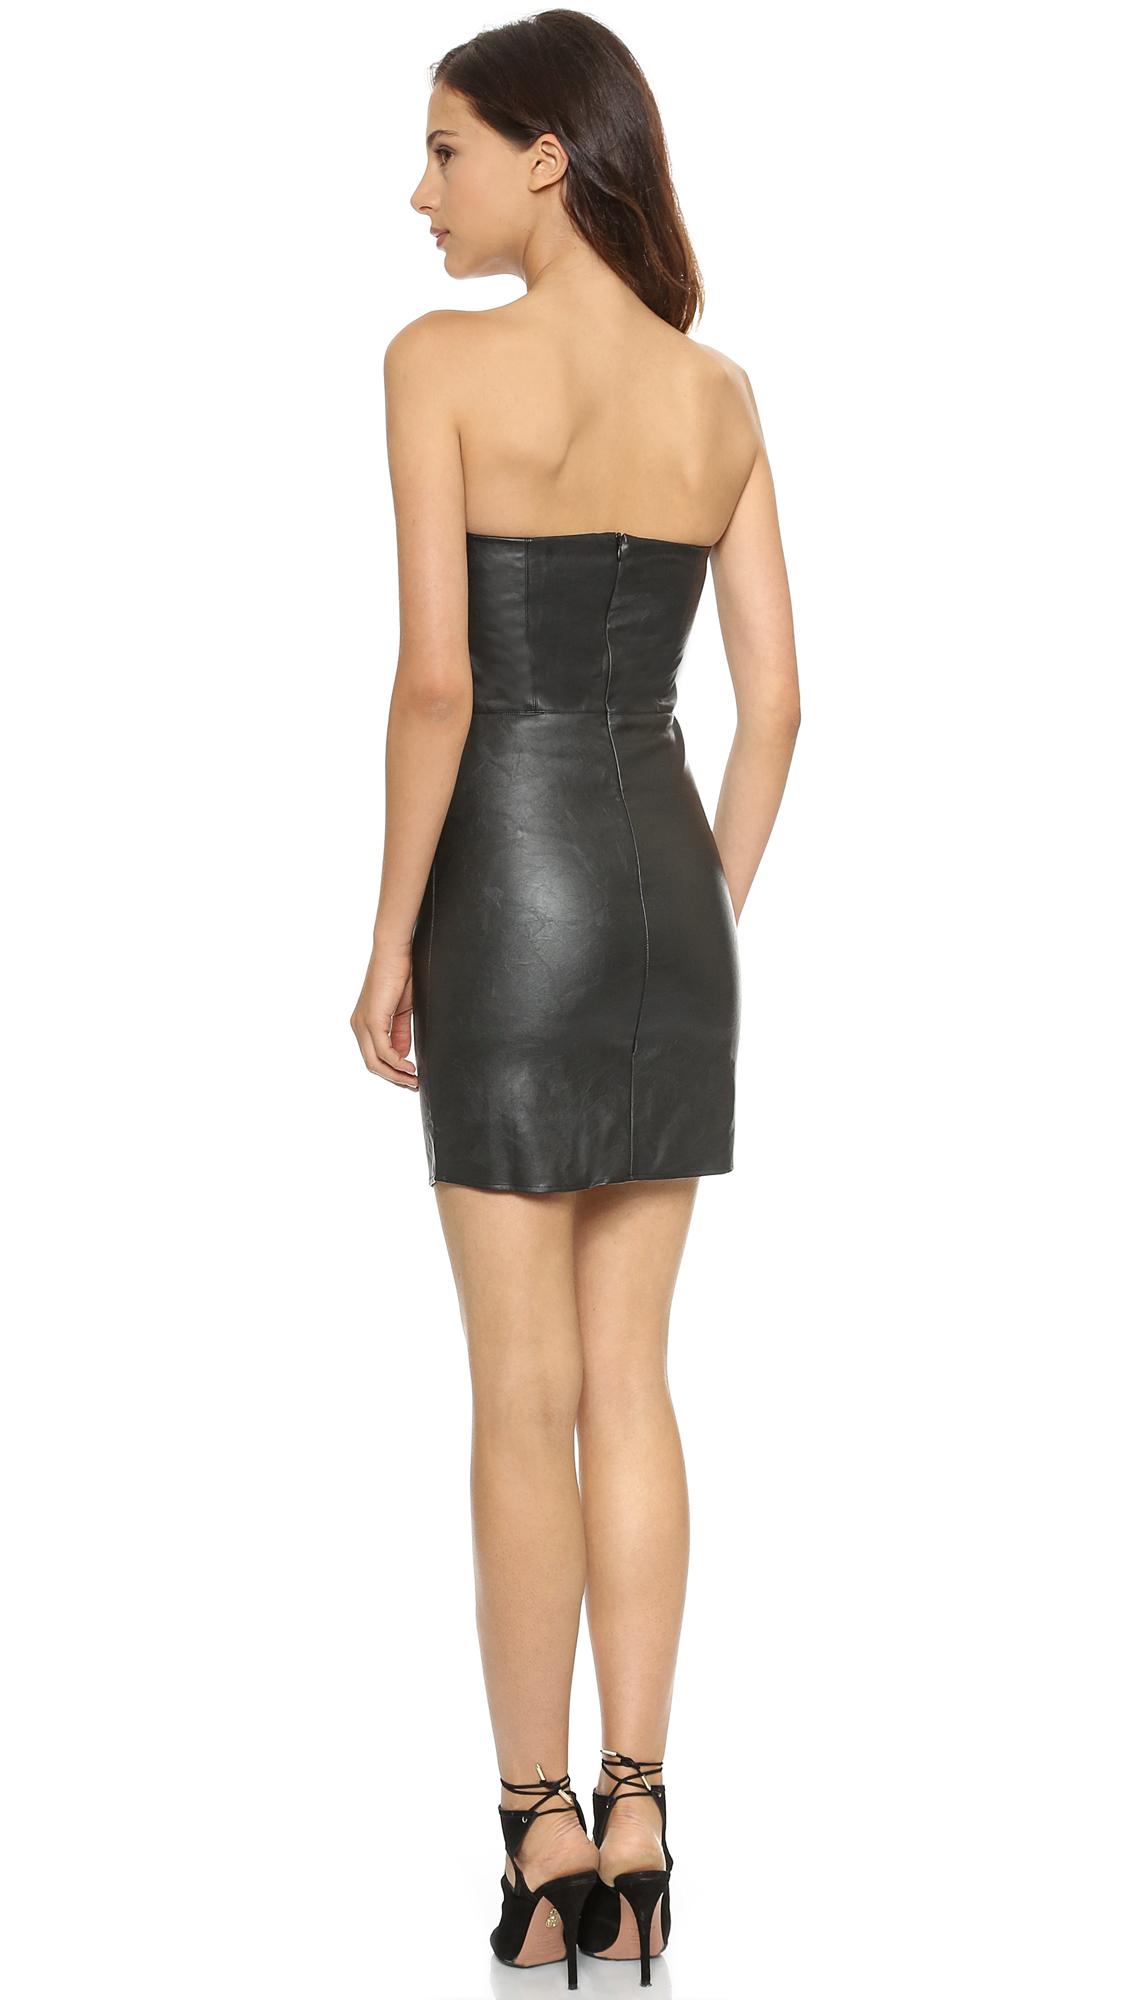 Myne Strapless Faux Leather Dress in Black | Lyst